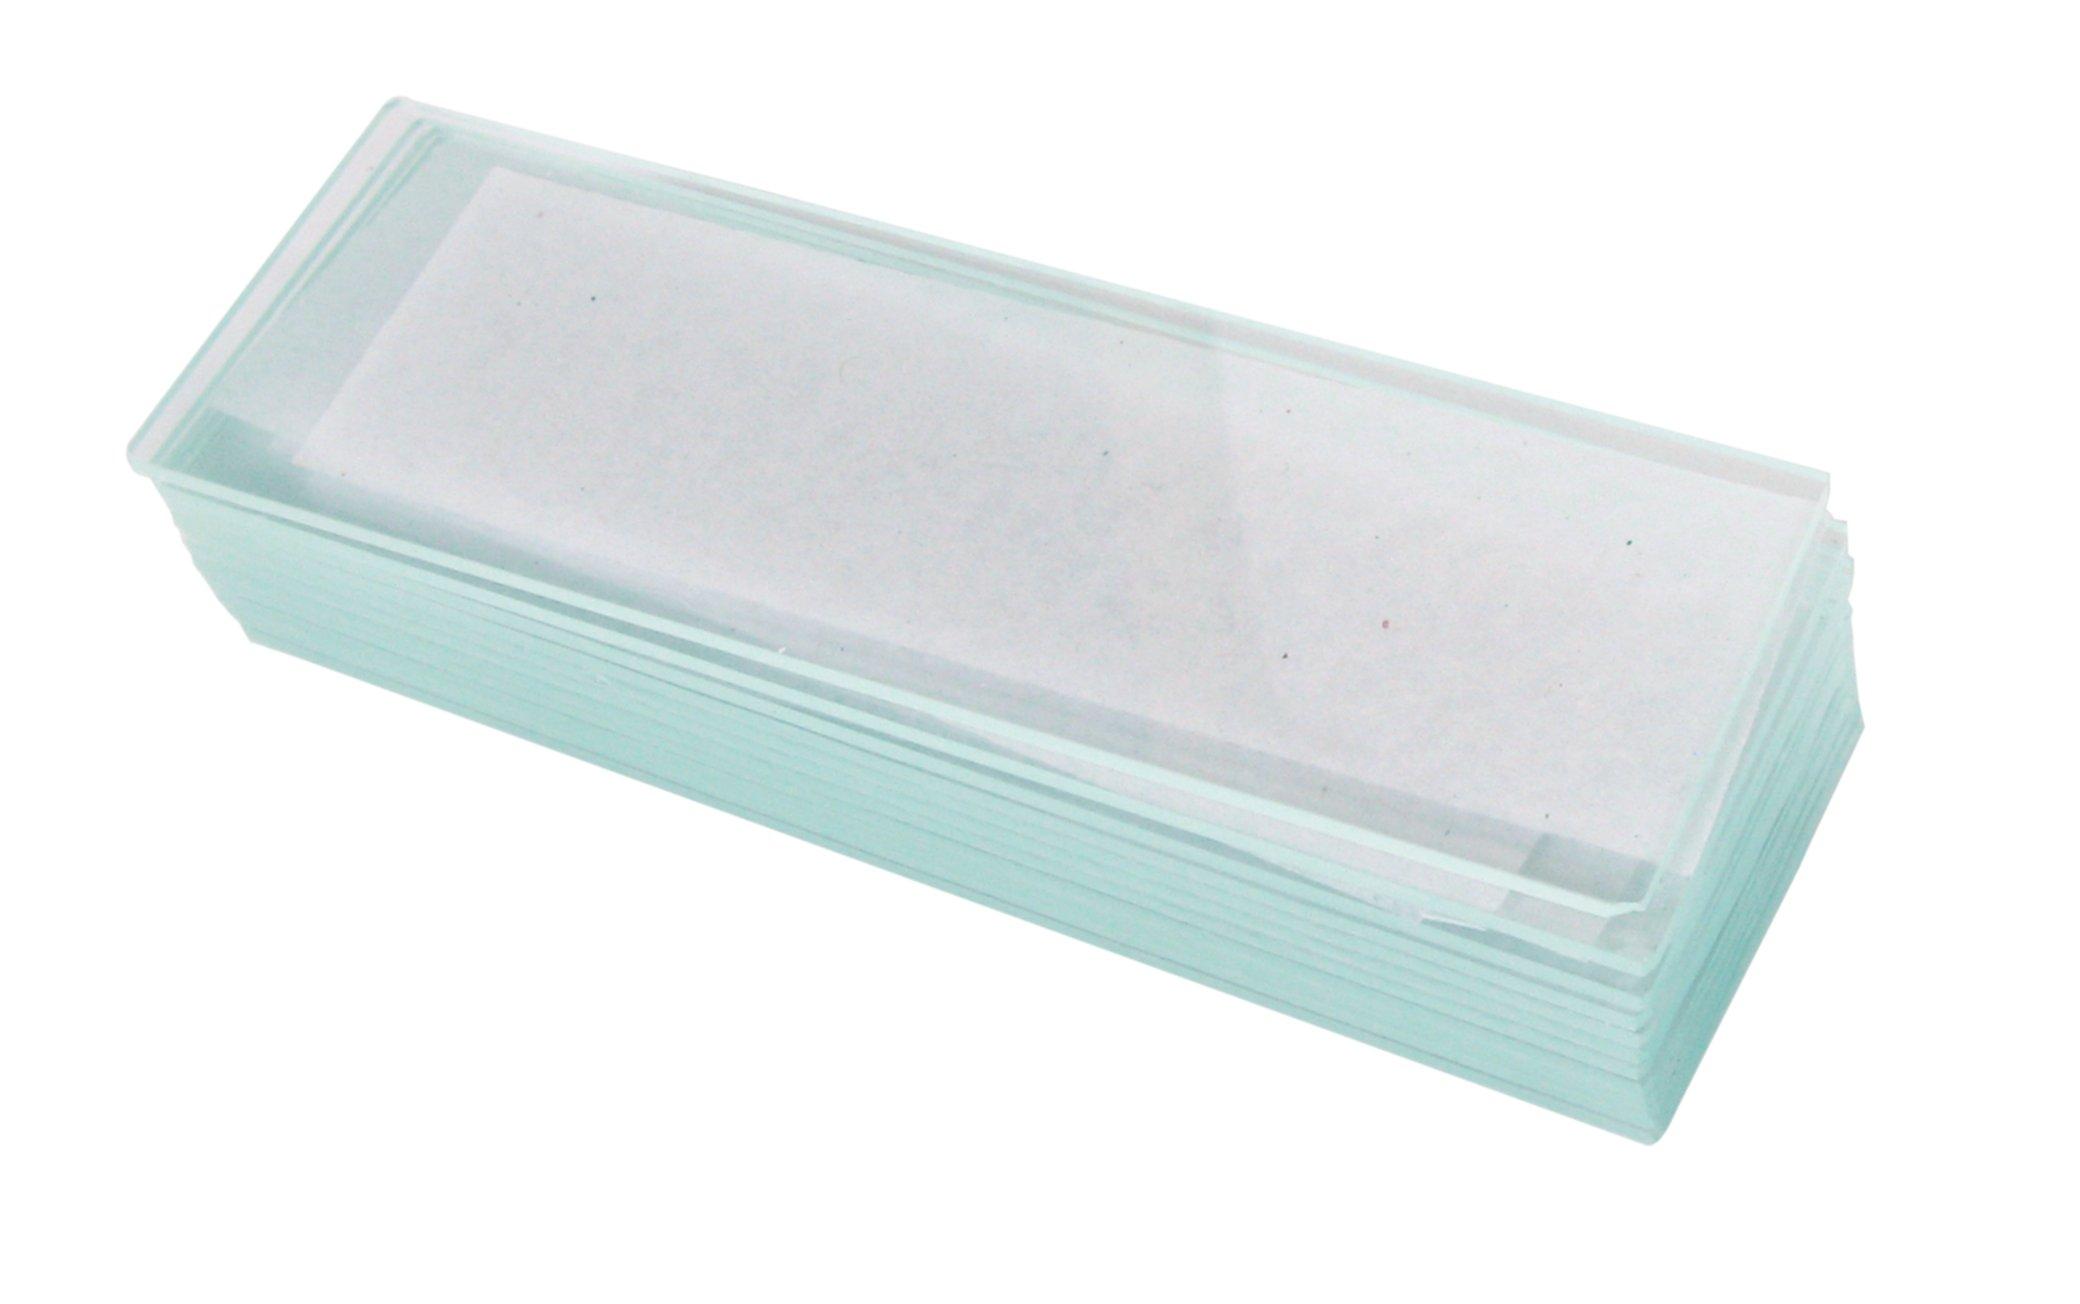 American Educational Glass Single-Cavity Microscope Slide, 76.2mm Length, 25.1mm Width, 1.1-1.2mm Thick (Bundle of 60)